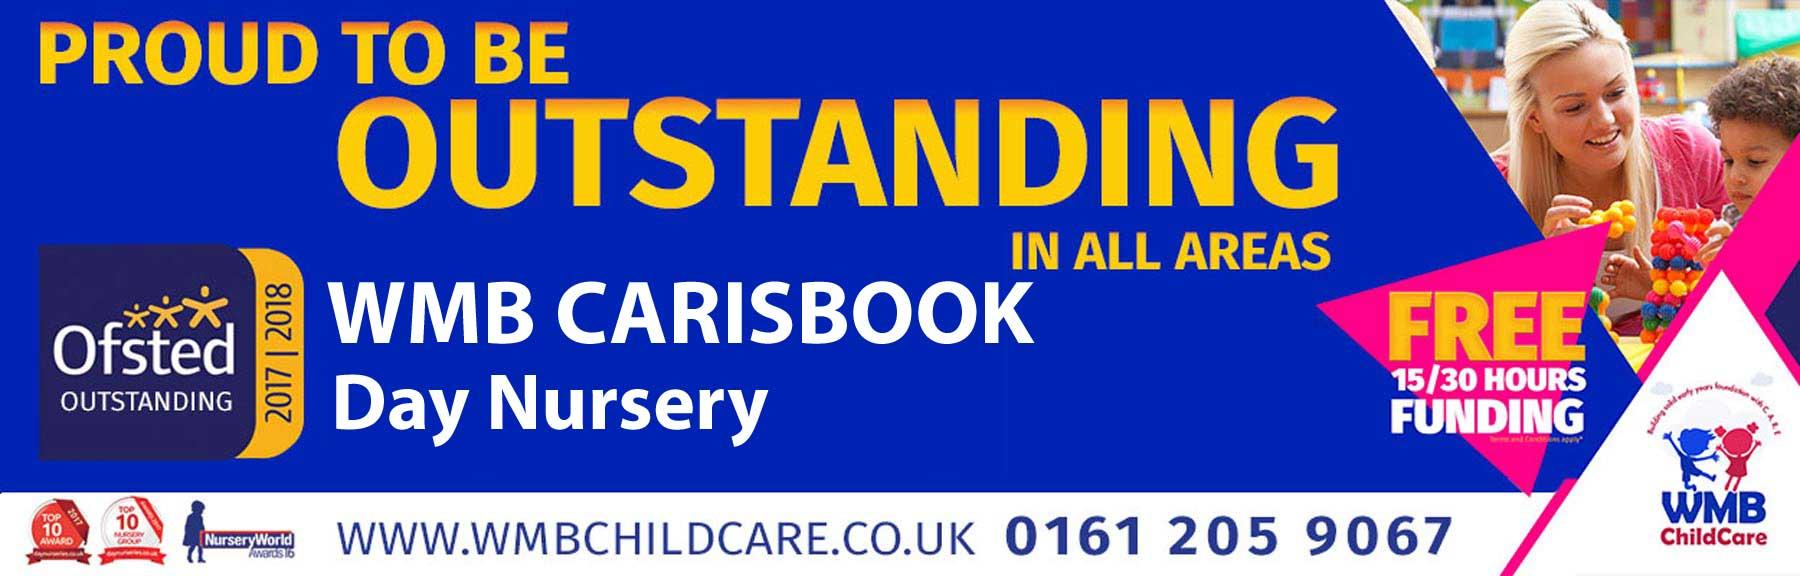 About WMB Carisbrook